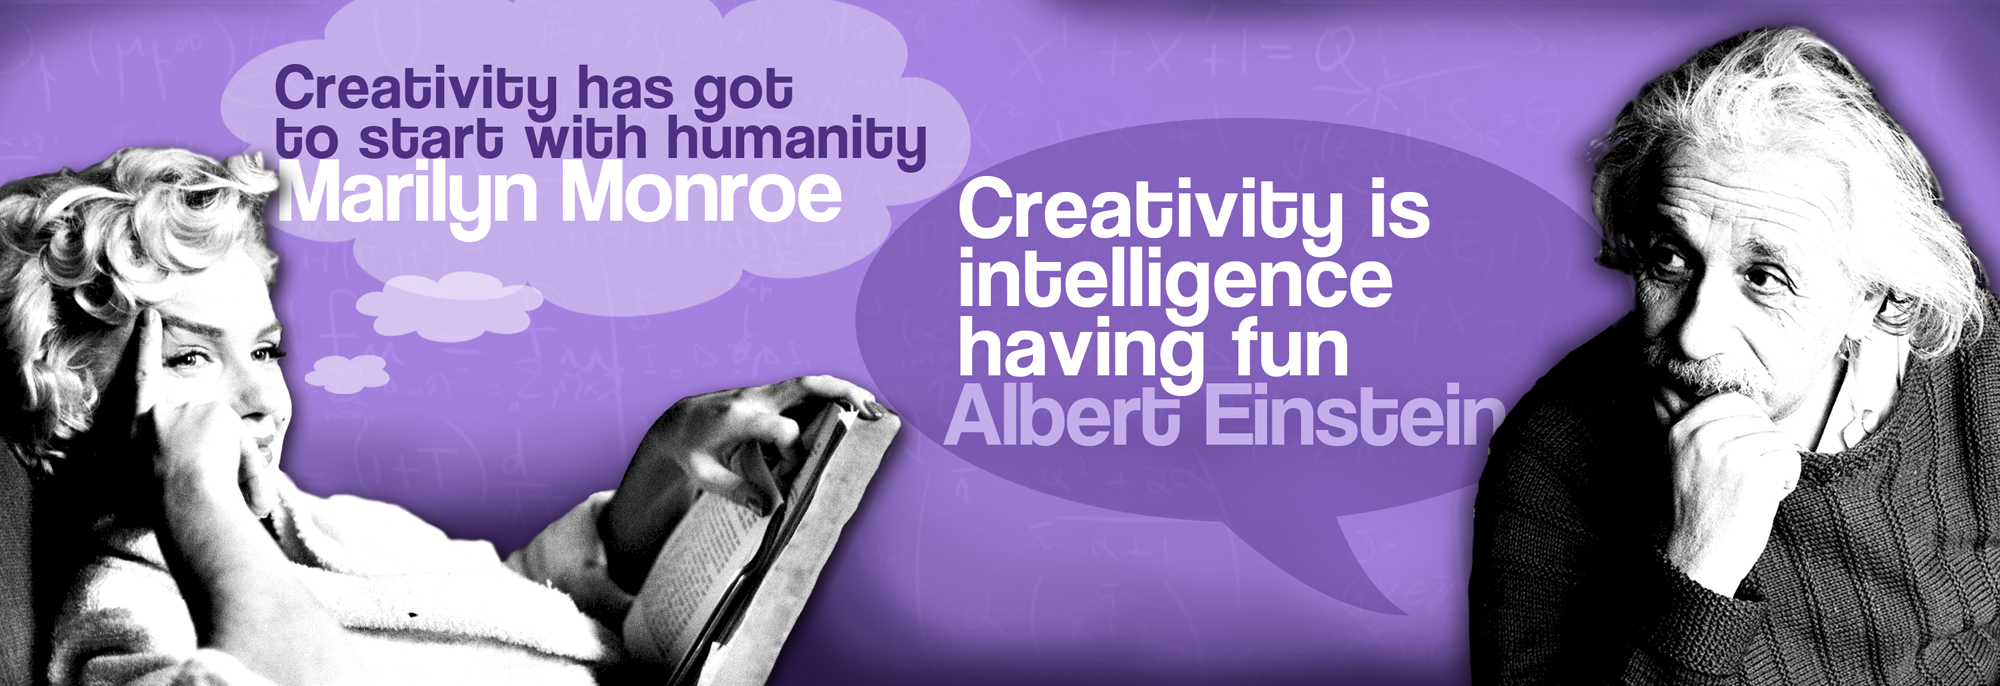 Creativity in Education - Albert Einstein and Marilyn Monroe